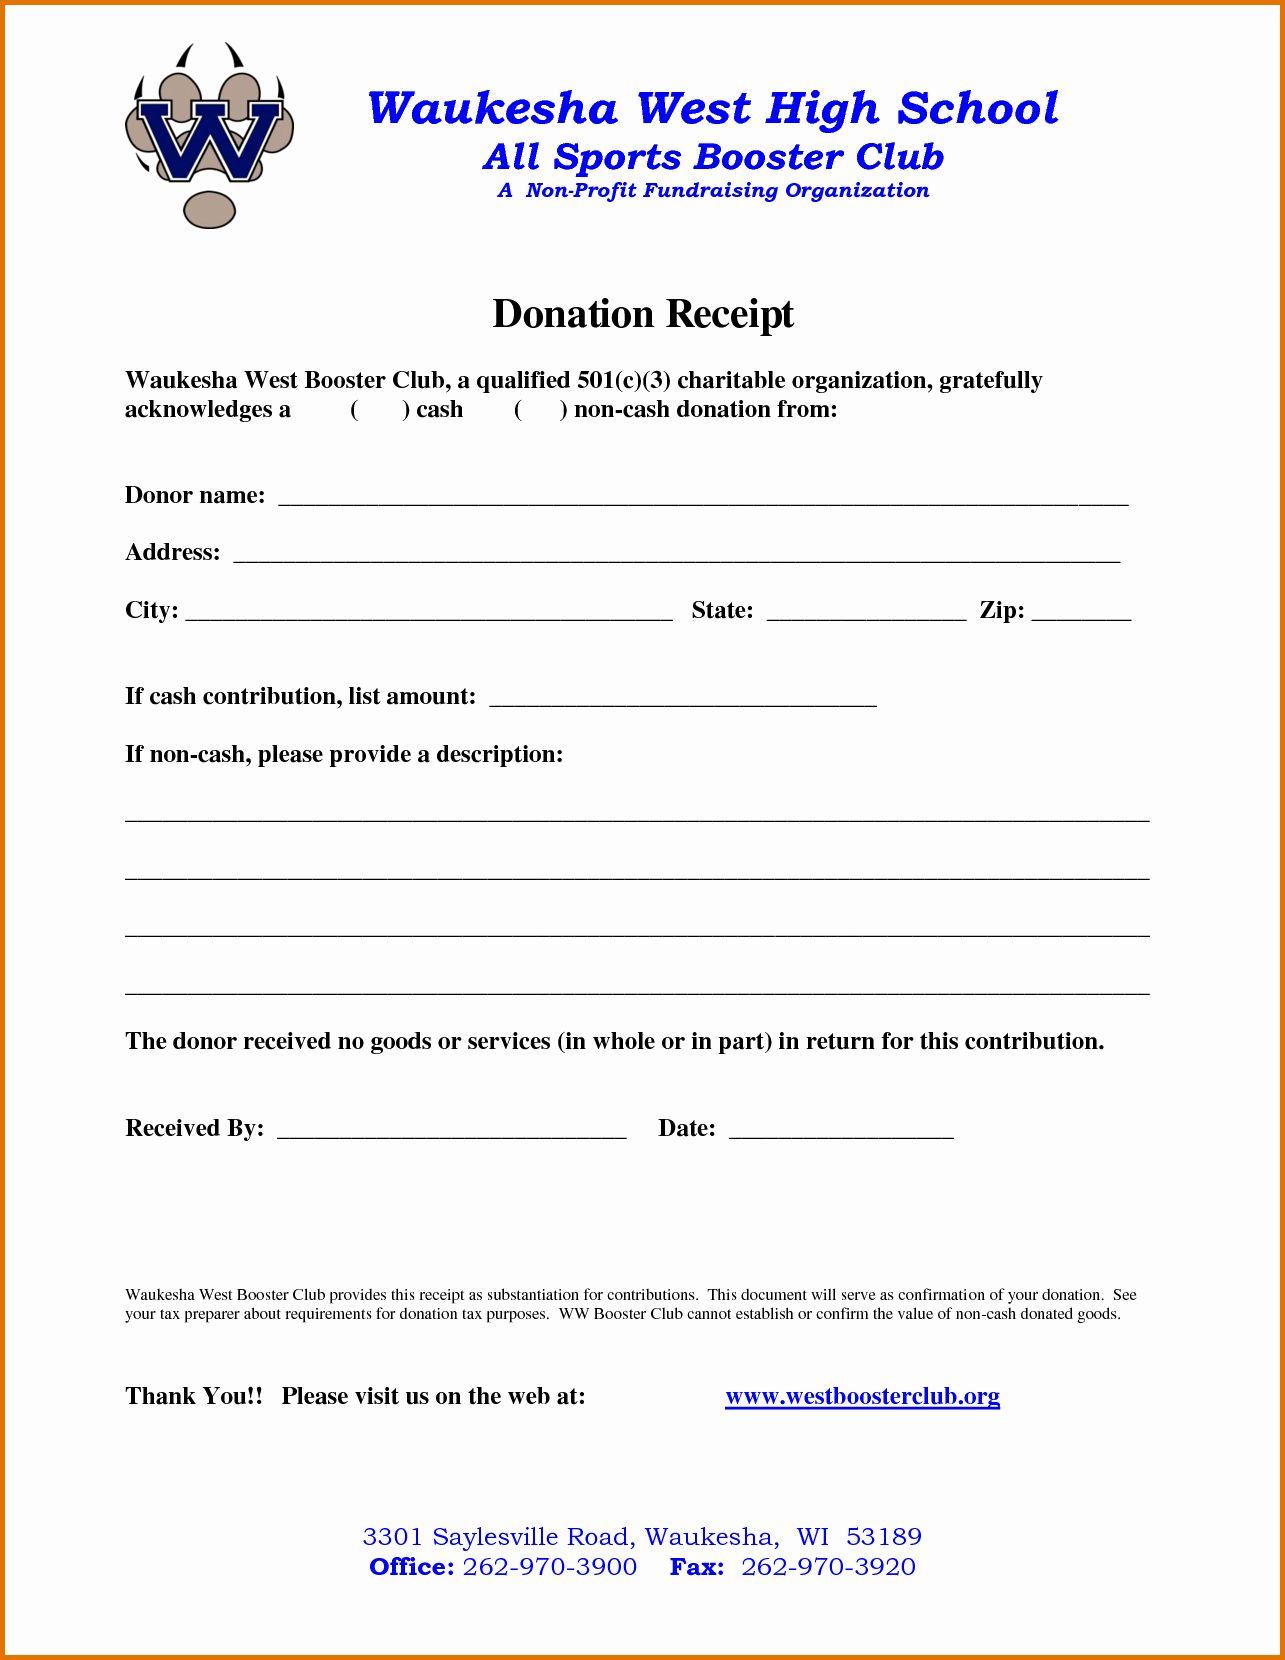 Non Profit Donation Form Template Awesome Non Profit Donation Receipt Templatereference Letters Non Profit Donations Fundraising Organization Donation Form